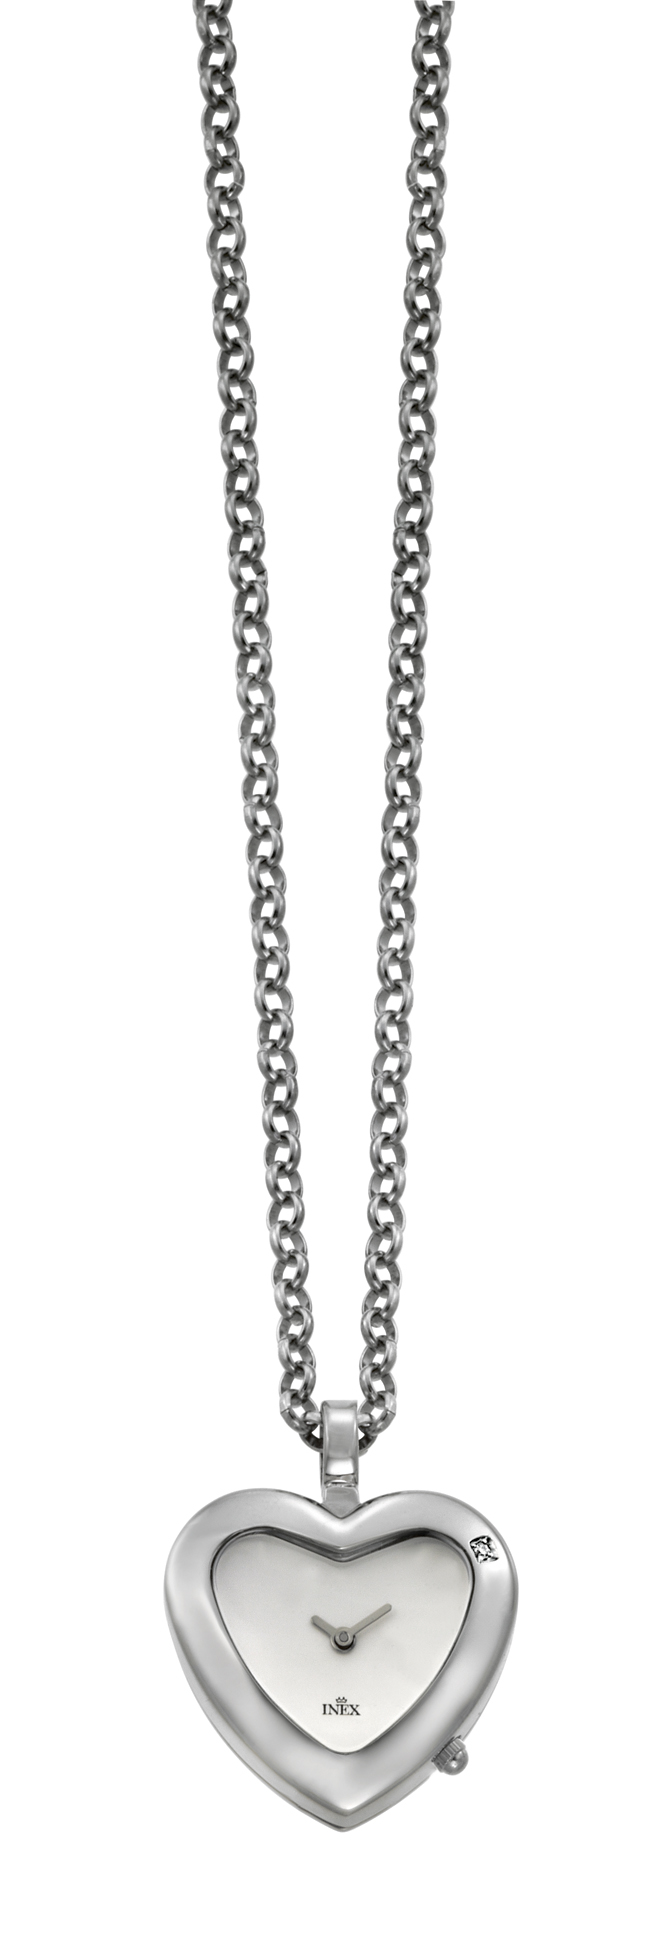 inex – Inex hjerte vedhængs ur - a34627s4 fra brodersen + kobborg